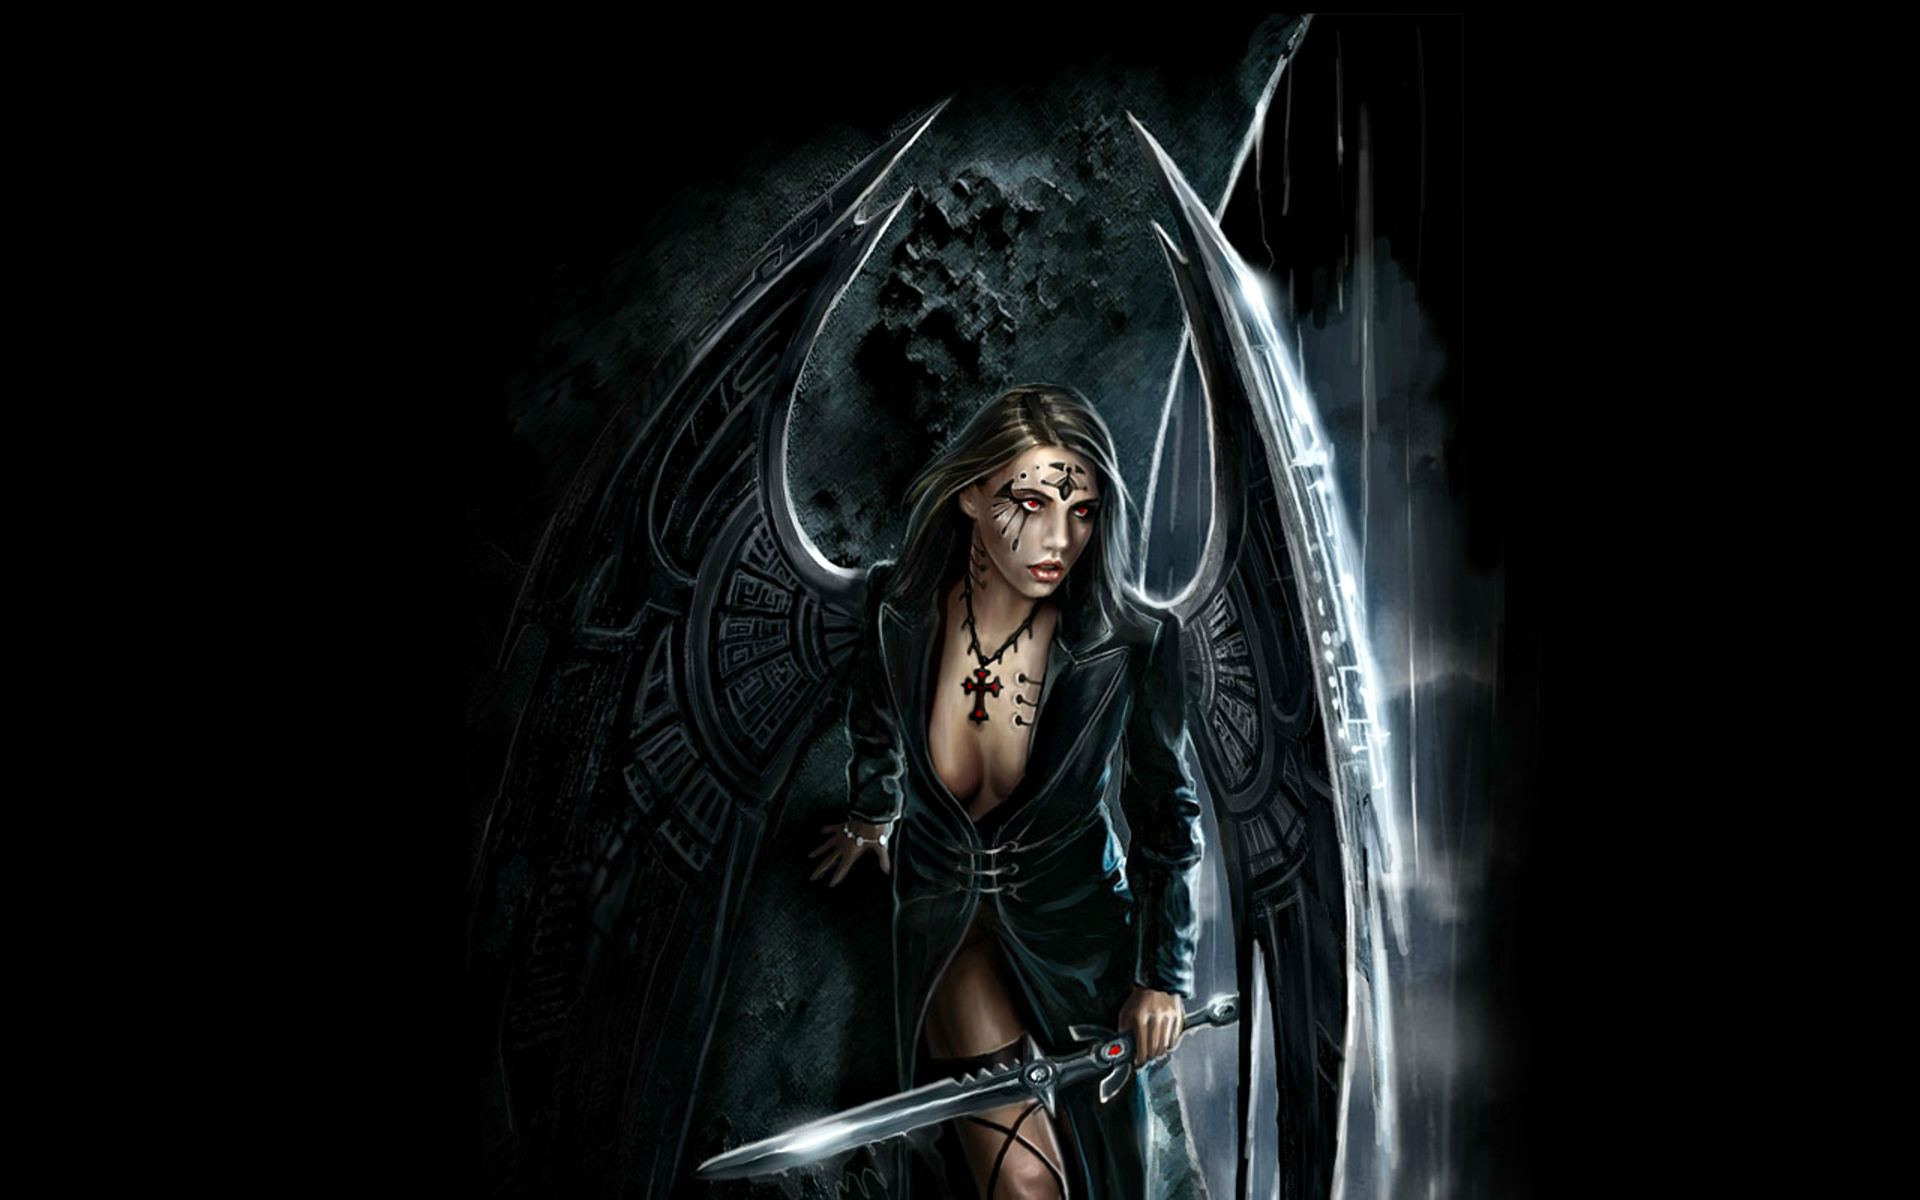 Borderlands 2 Wallpaper Hd Fantasy Art Warriors Gothic Angels Weapons Sword Women